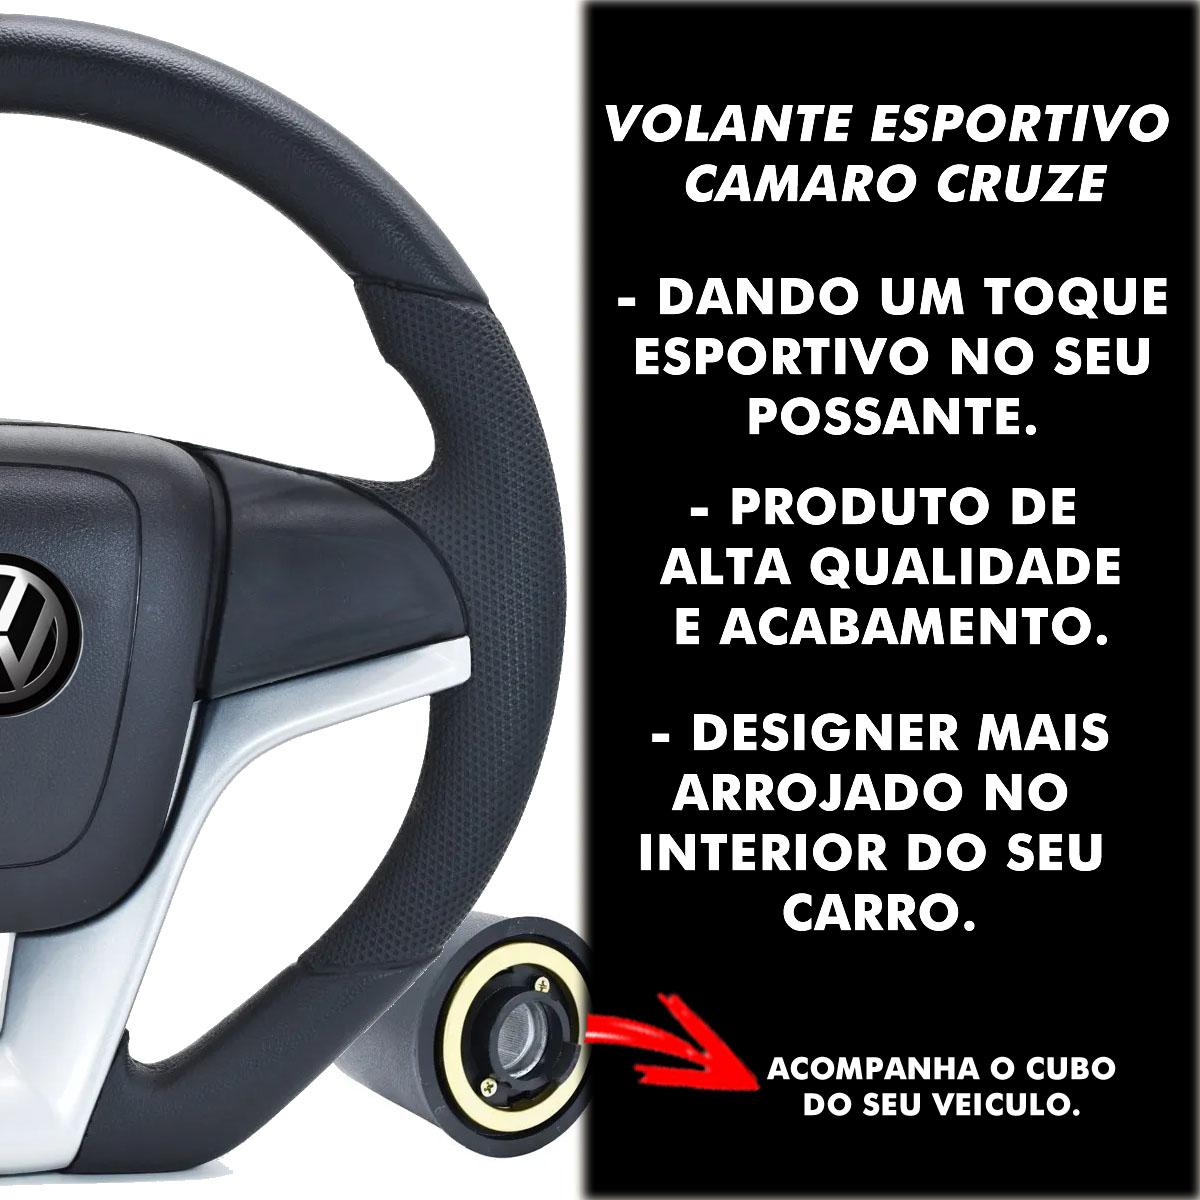 Volante Volkswagen Camaro Esportivo Cubo Gol Quadrado 1980 a 1996 G2 G3 G4 G5 G6 1994 a 2013 Poliparts